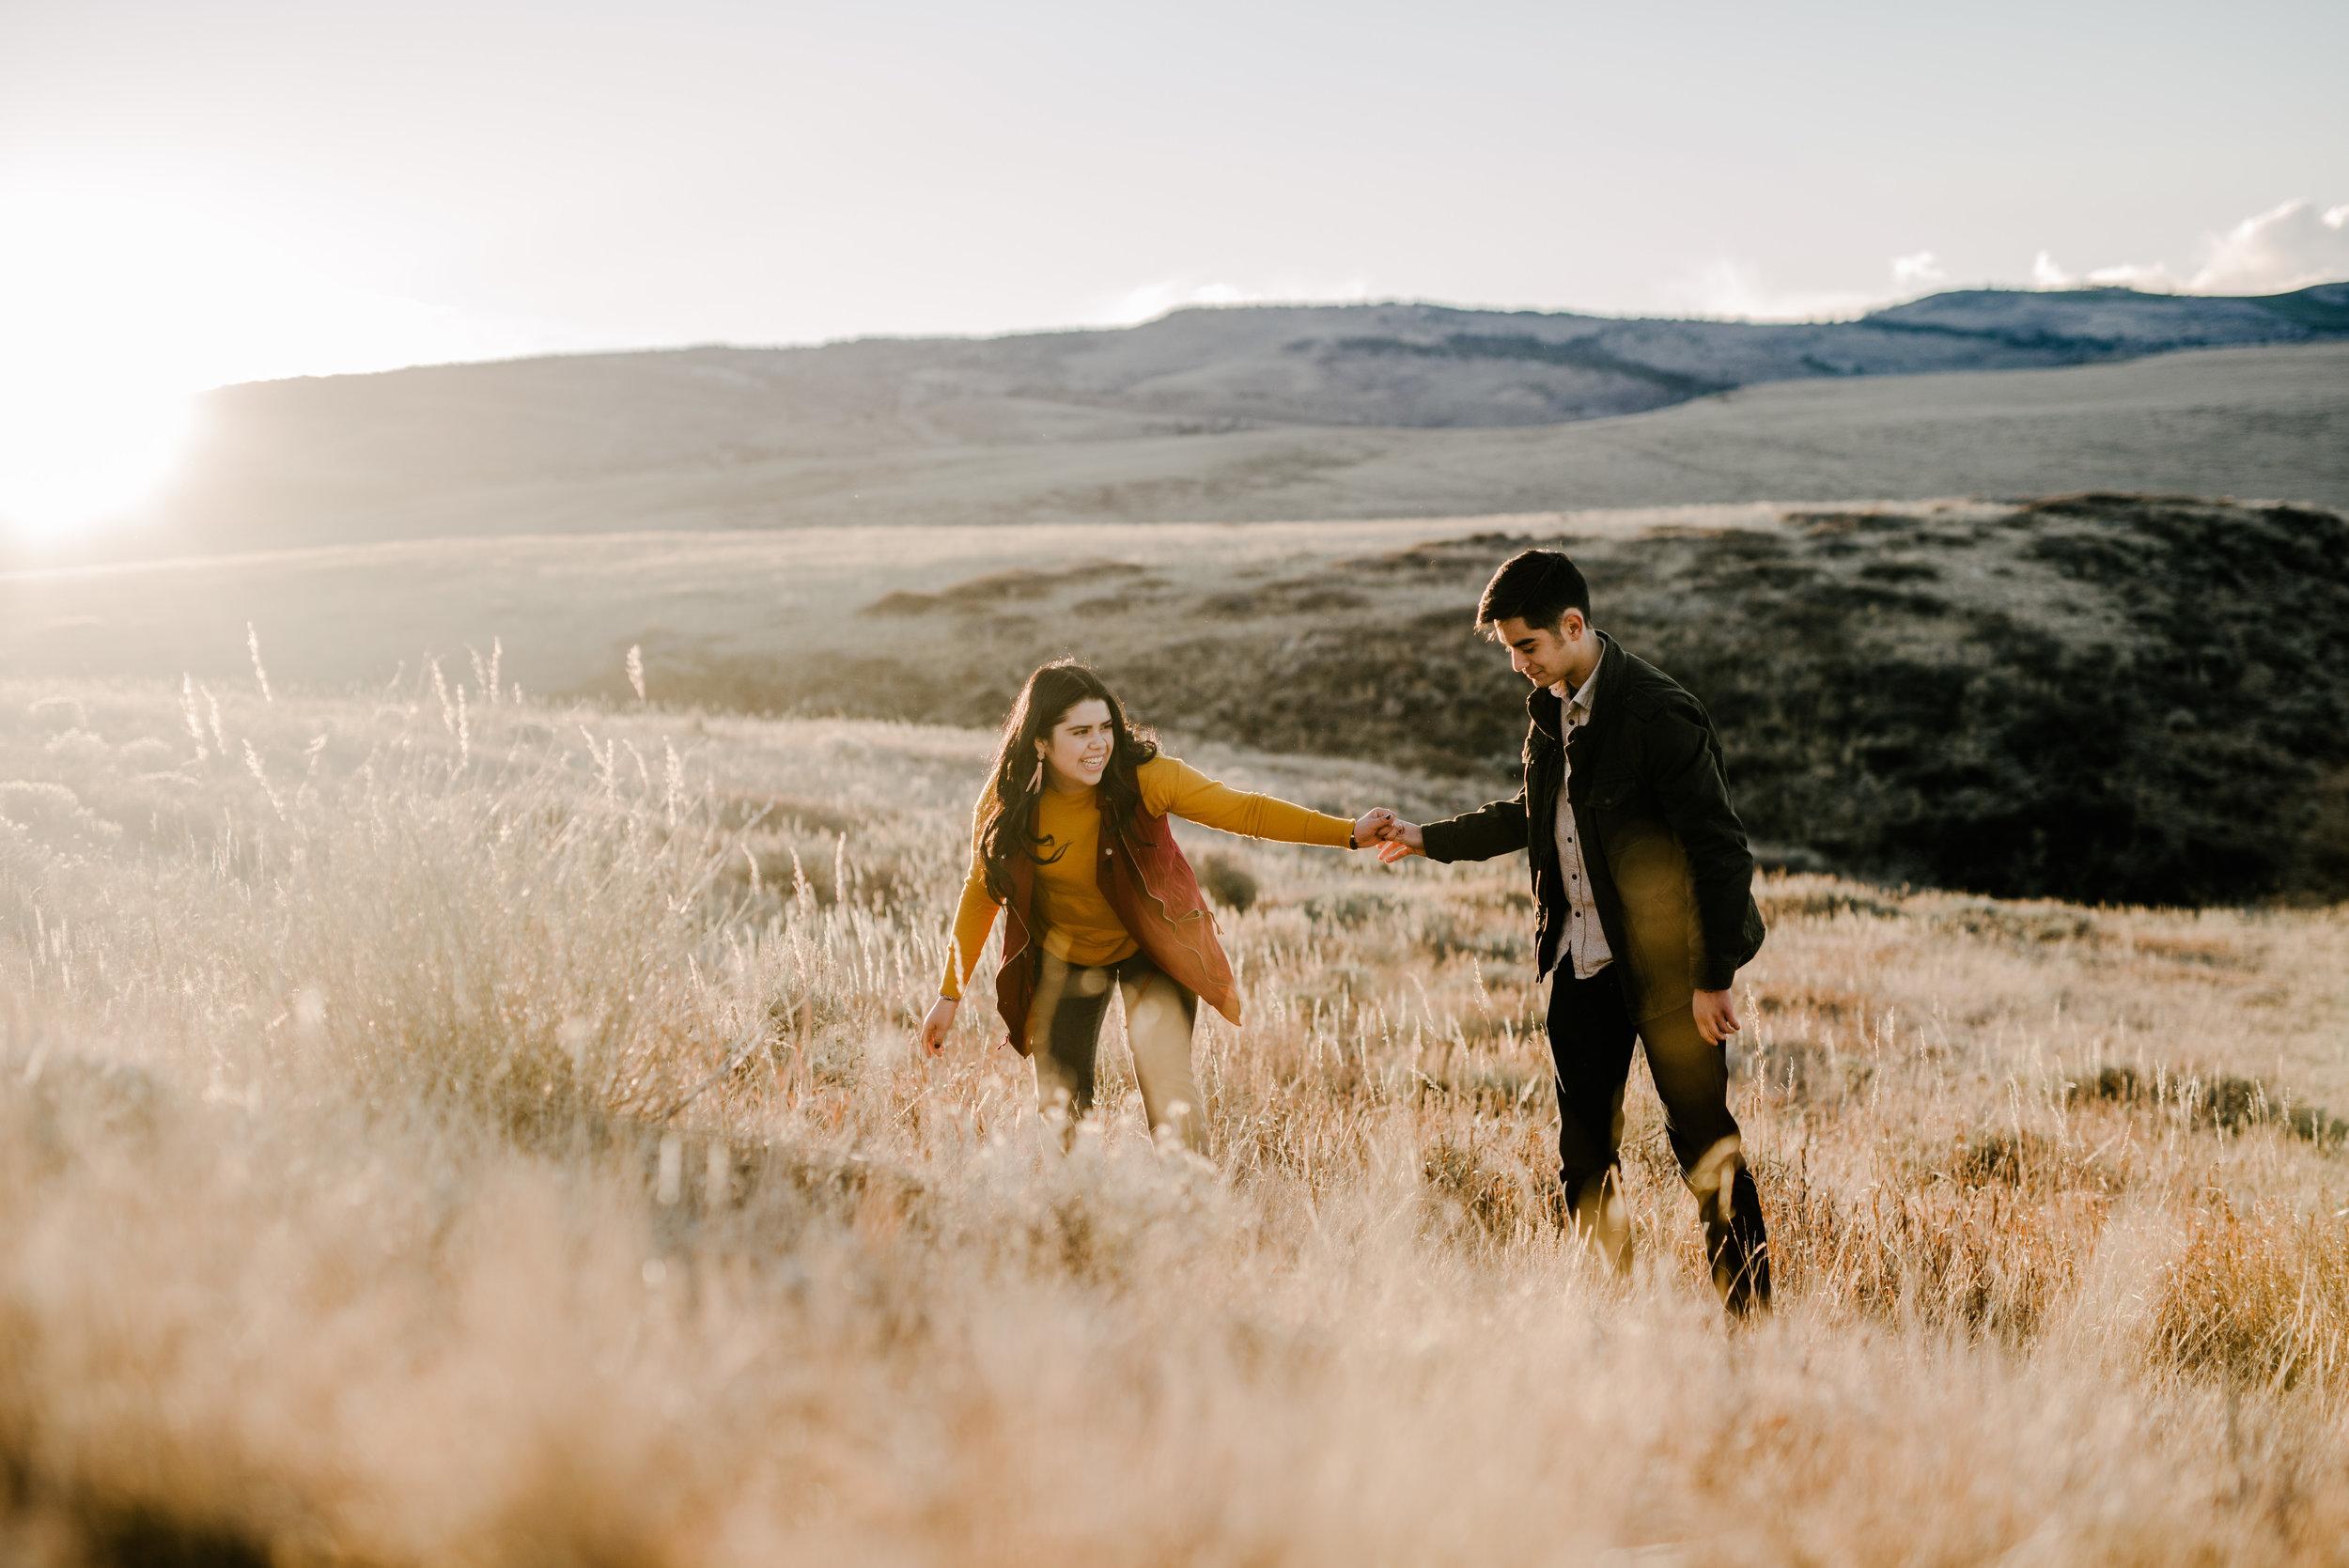 Citlalli_Wyoming Senior Photographer [Virginia Ruth Photography]-60.jpg